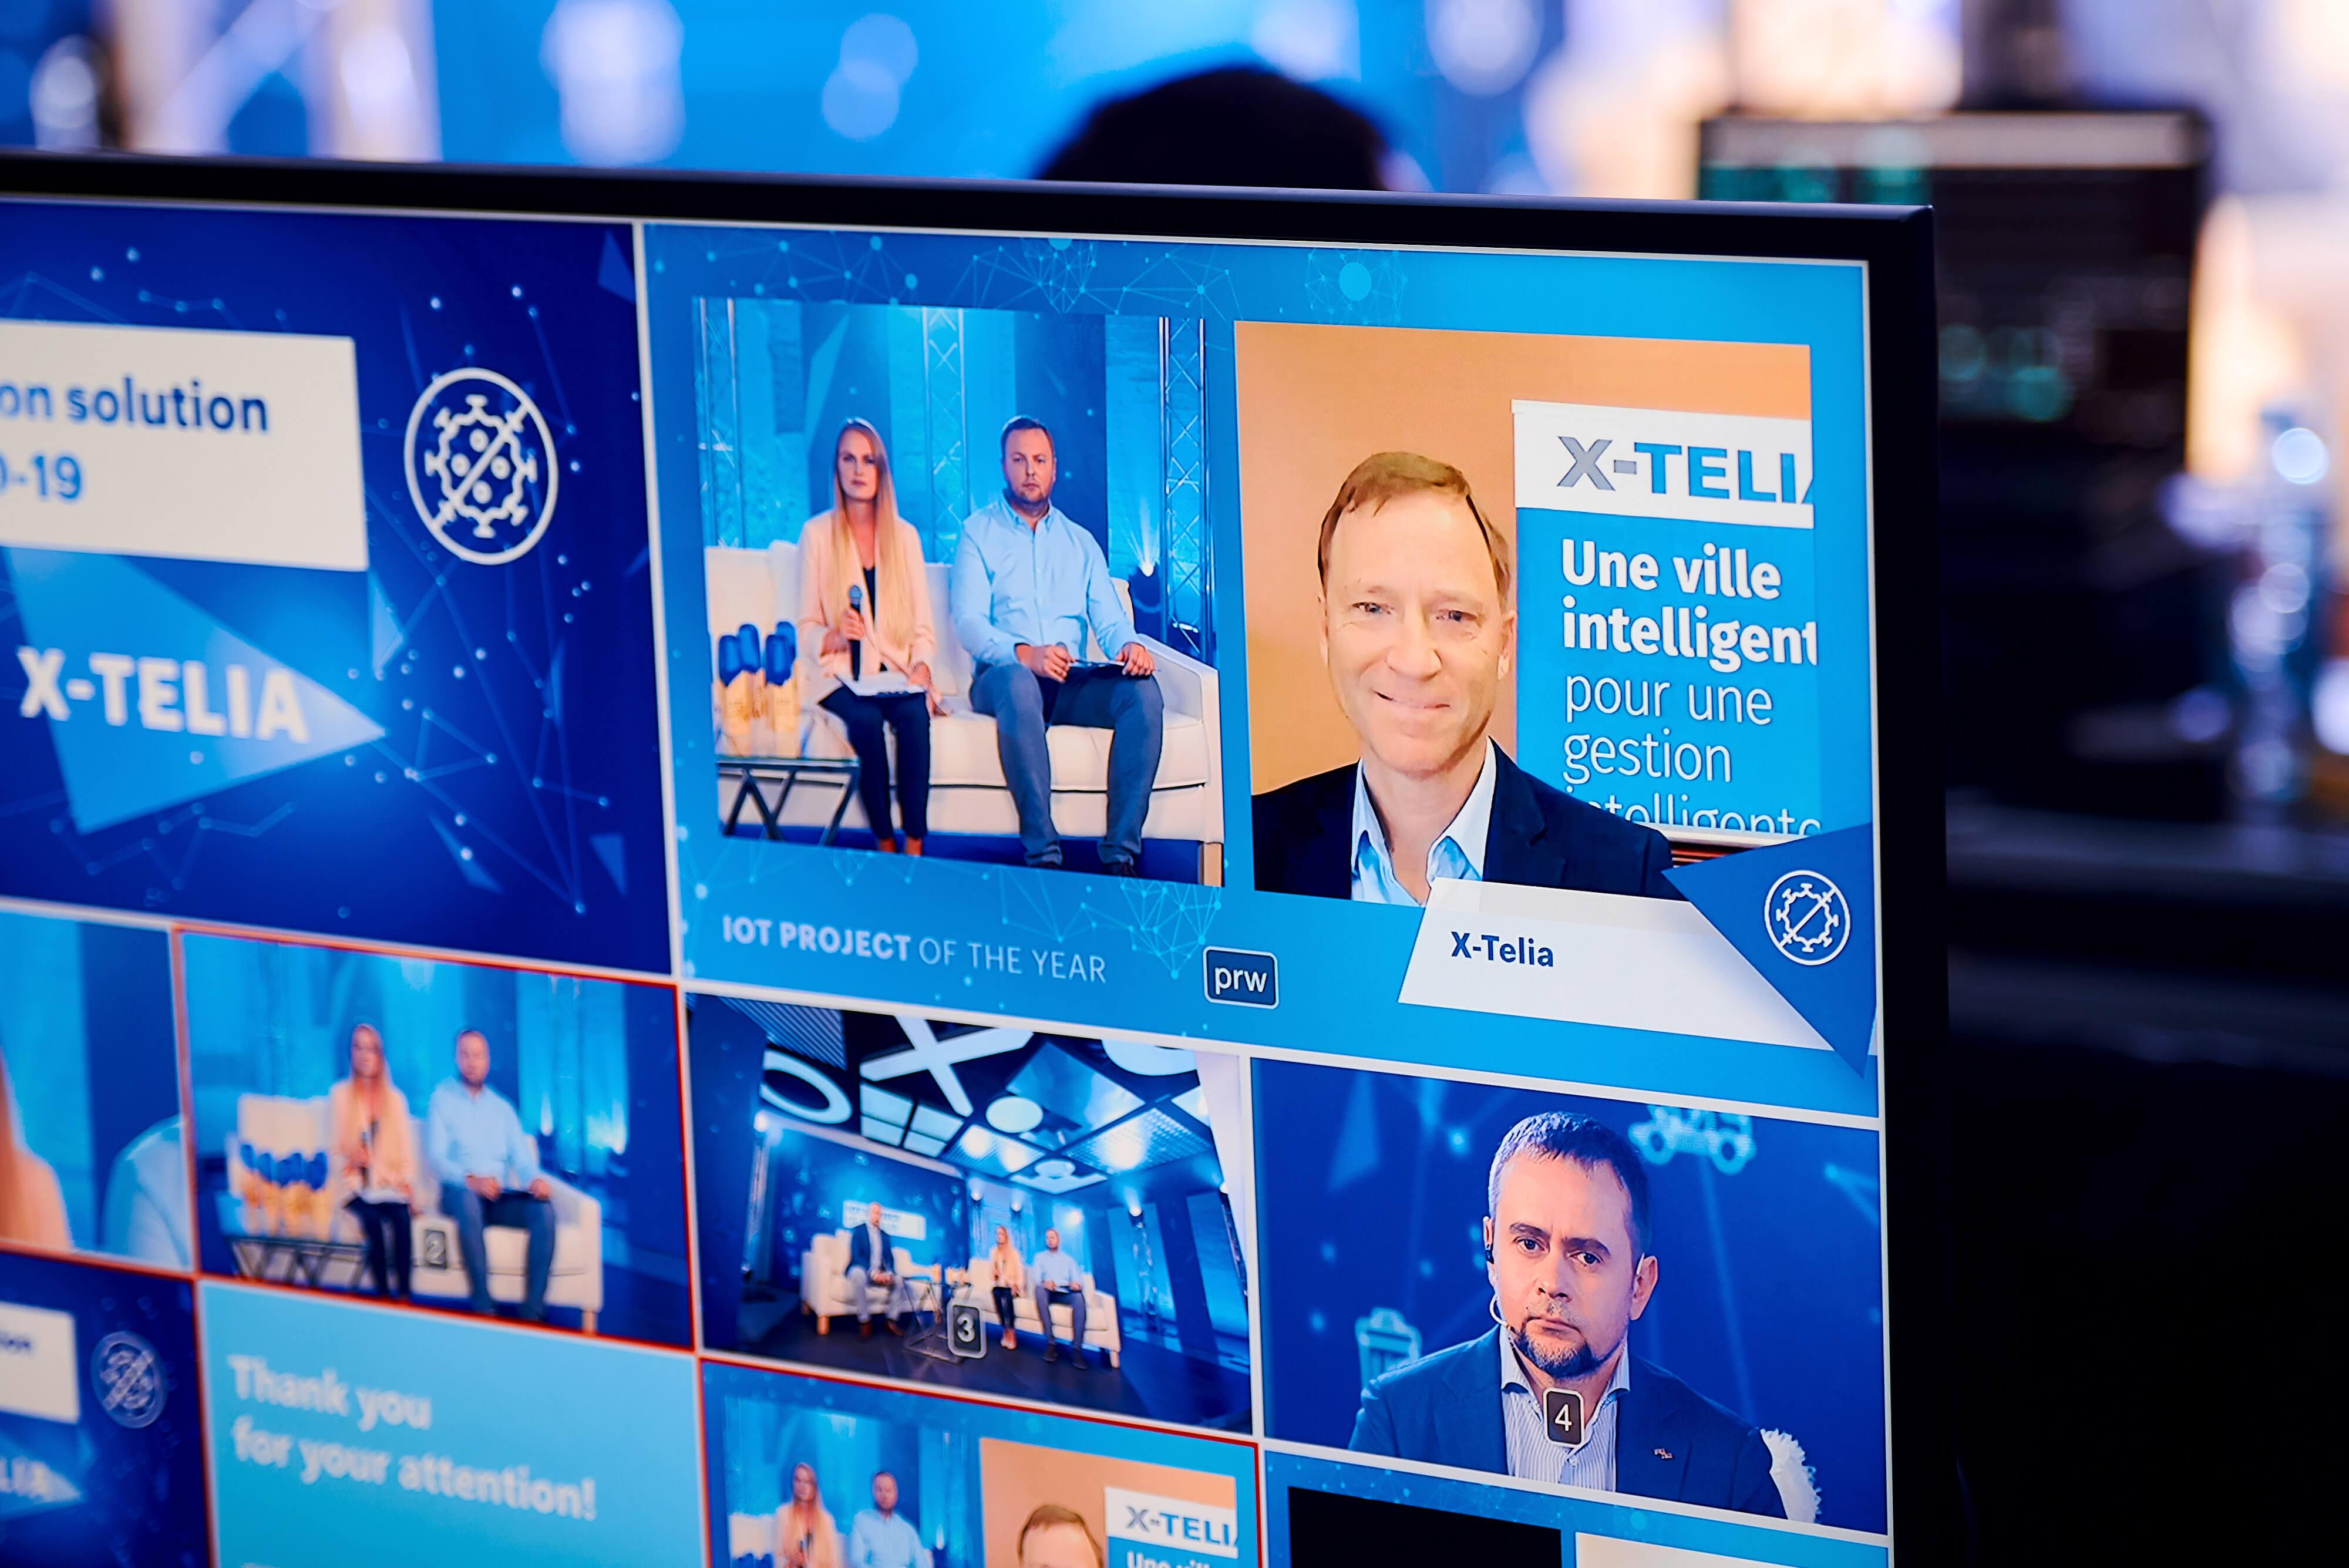 Команда X-Telia на церемонии награждения IoT project of the year